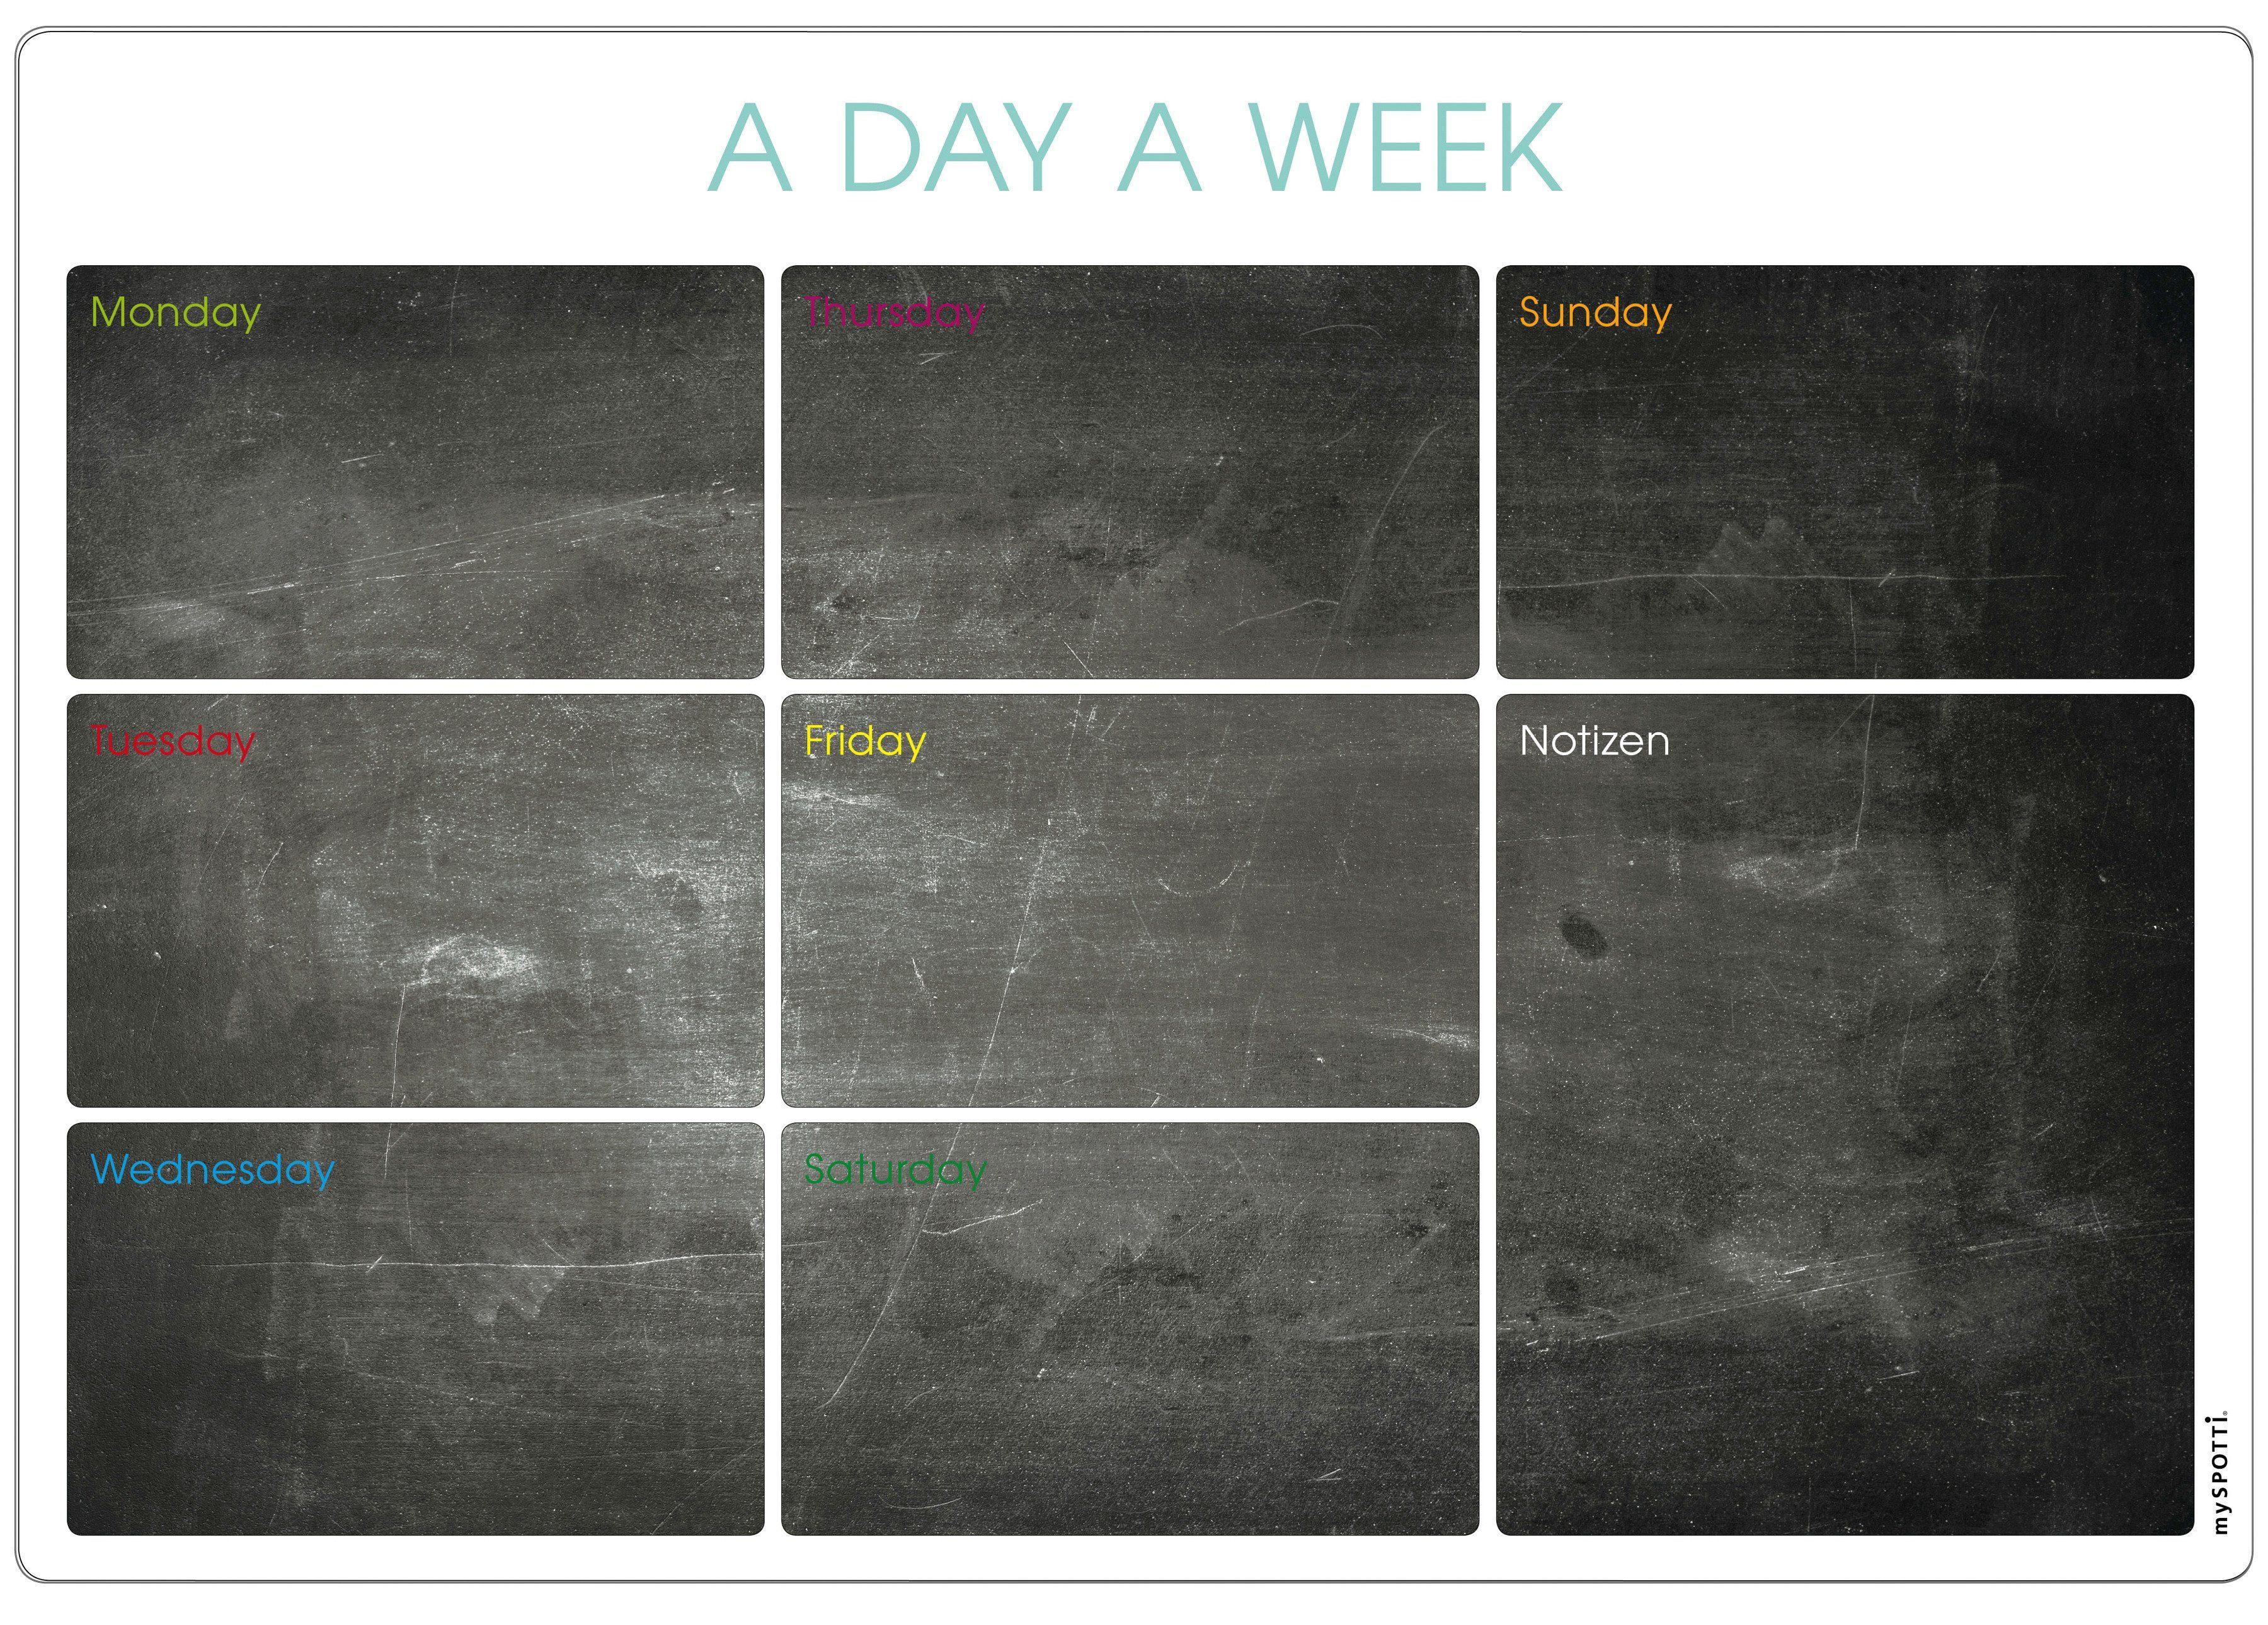 Küchenrückwand »memo to go«, A day a week, 70,5x49 cm